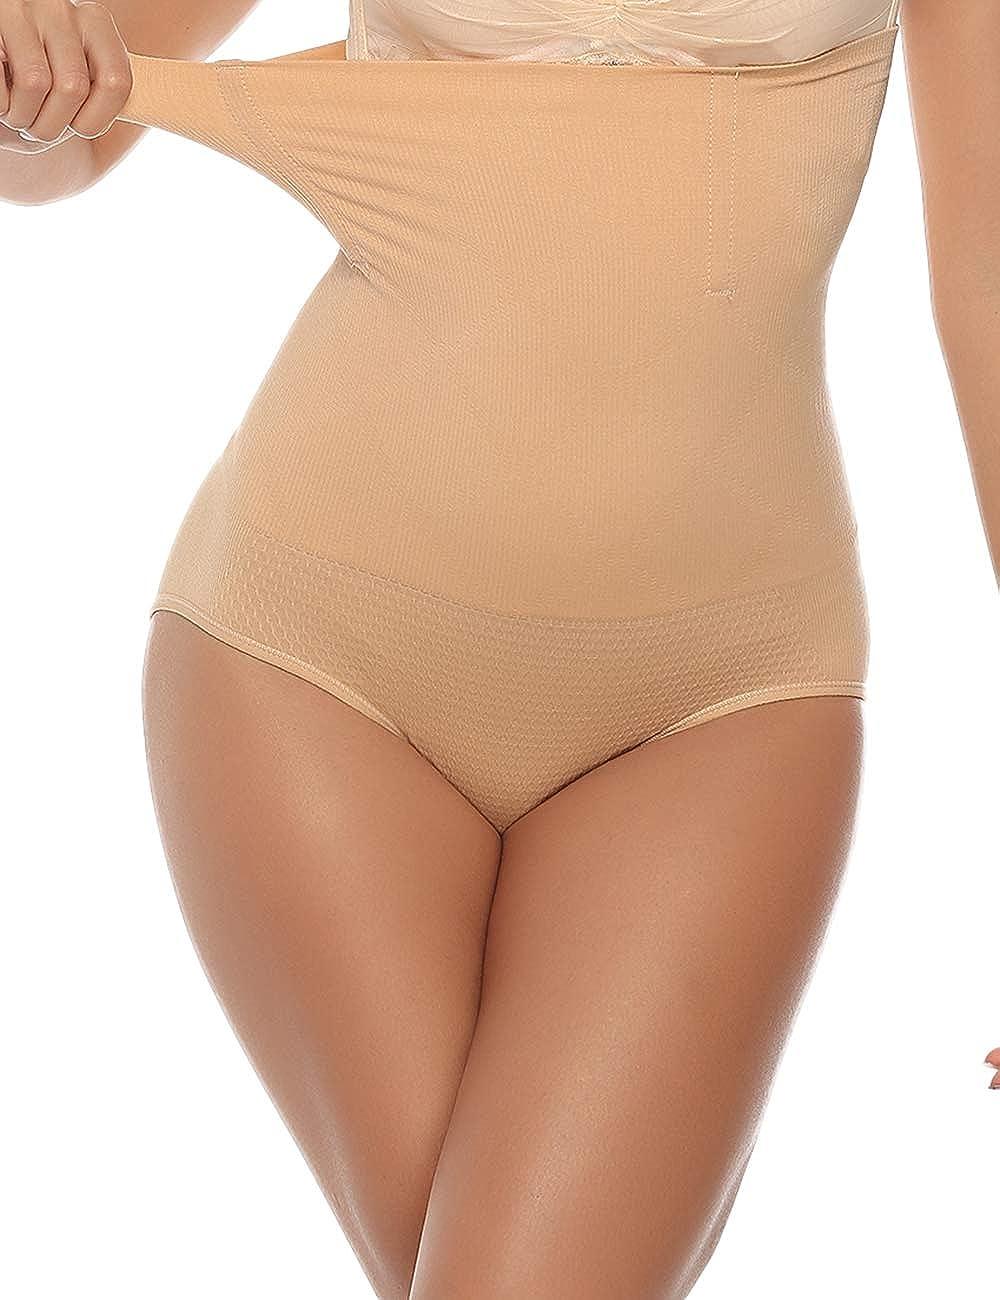 Abollria Miederpants Damen Figurenformend Miederhose Miederslip Shapewear Bauch Weg Stark Body Shaper optisch schlankere Silhouette